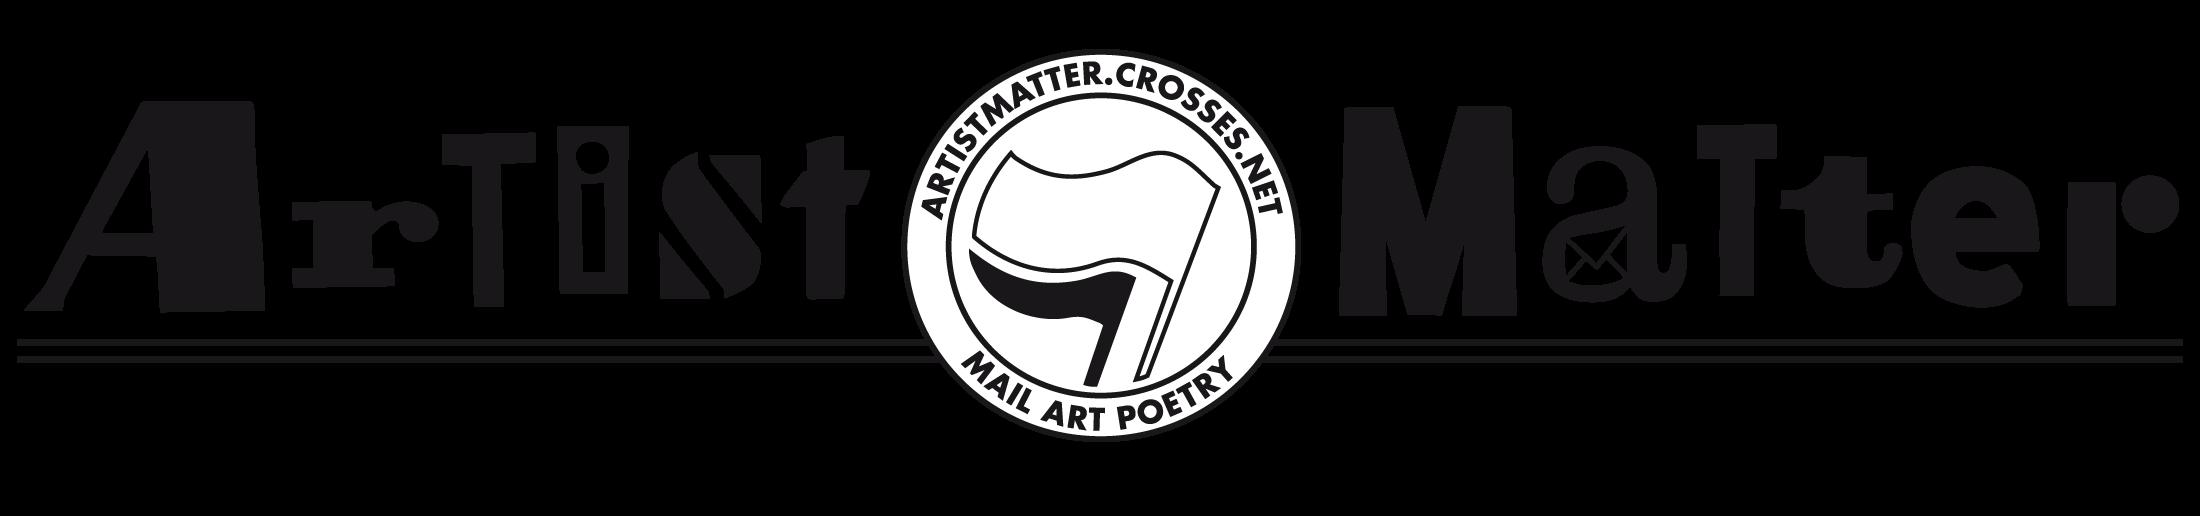 Artist Matter Zine | Crosses.Net